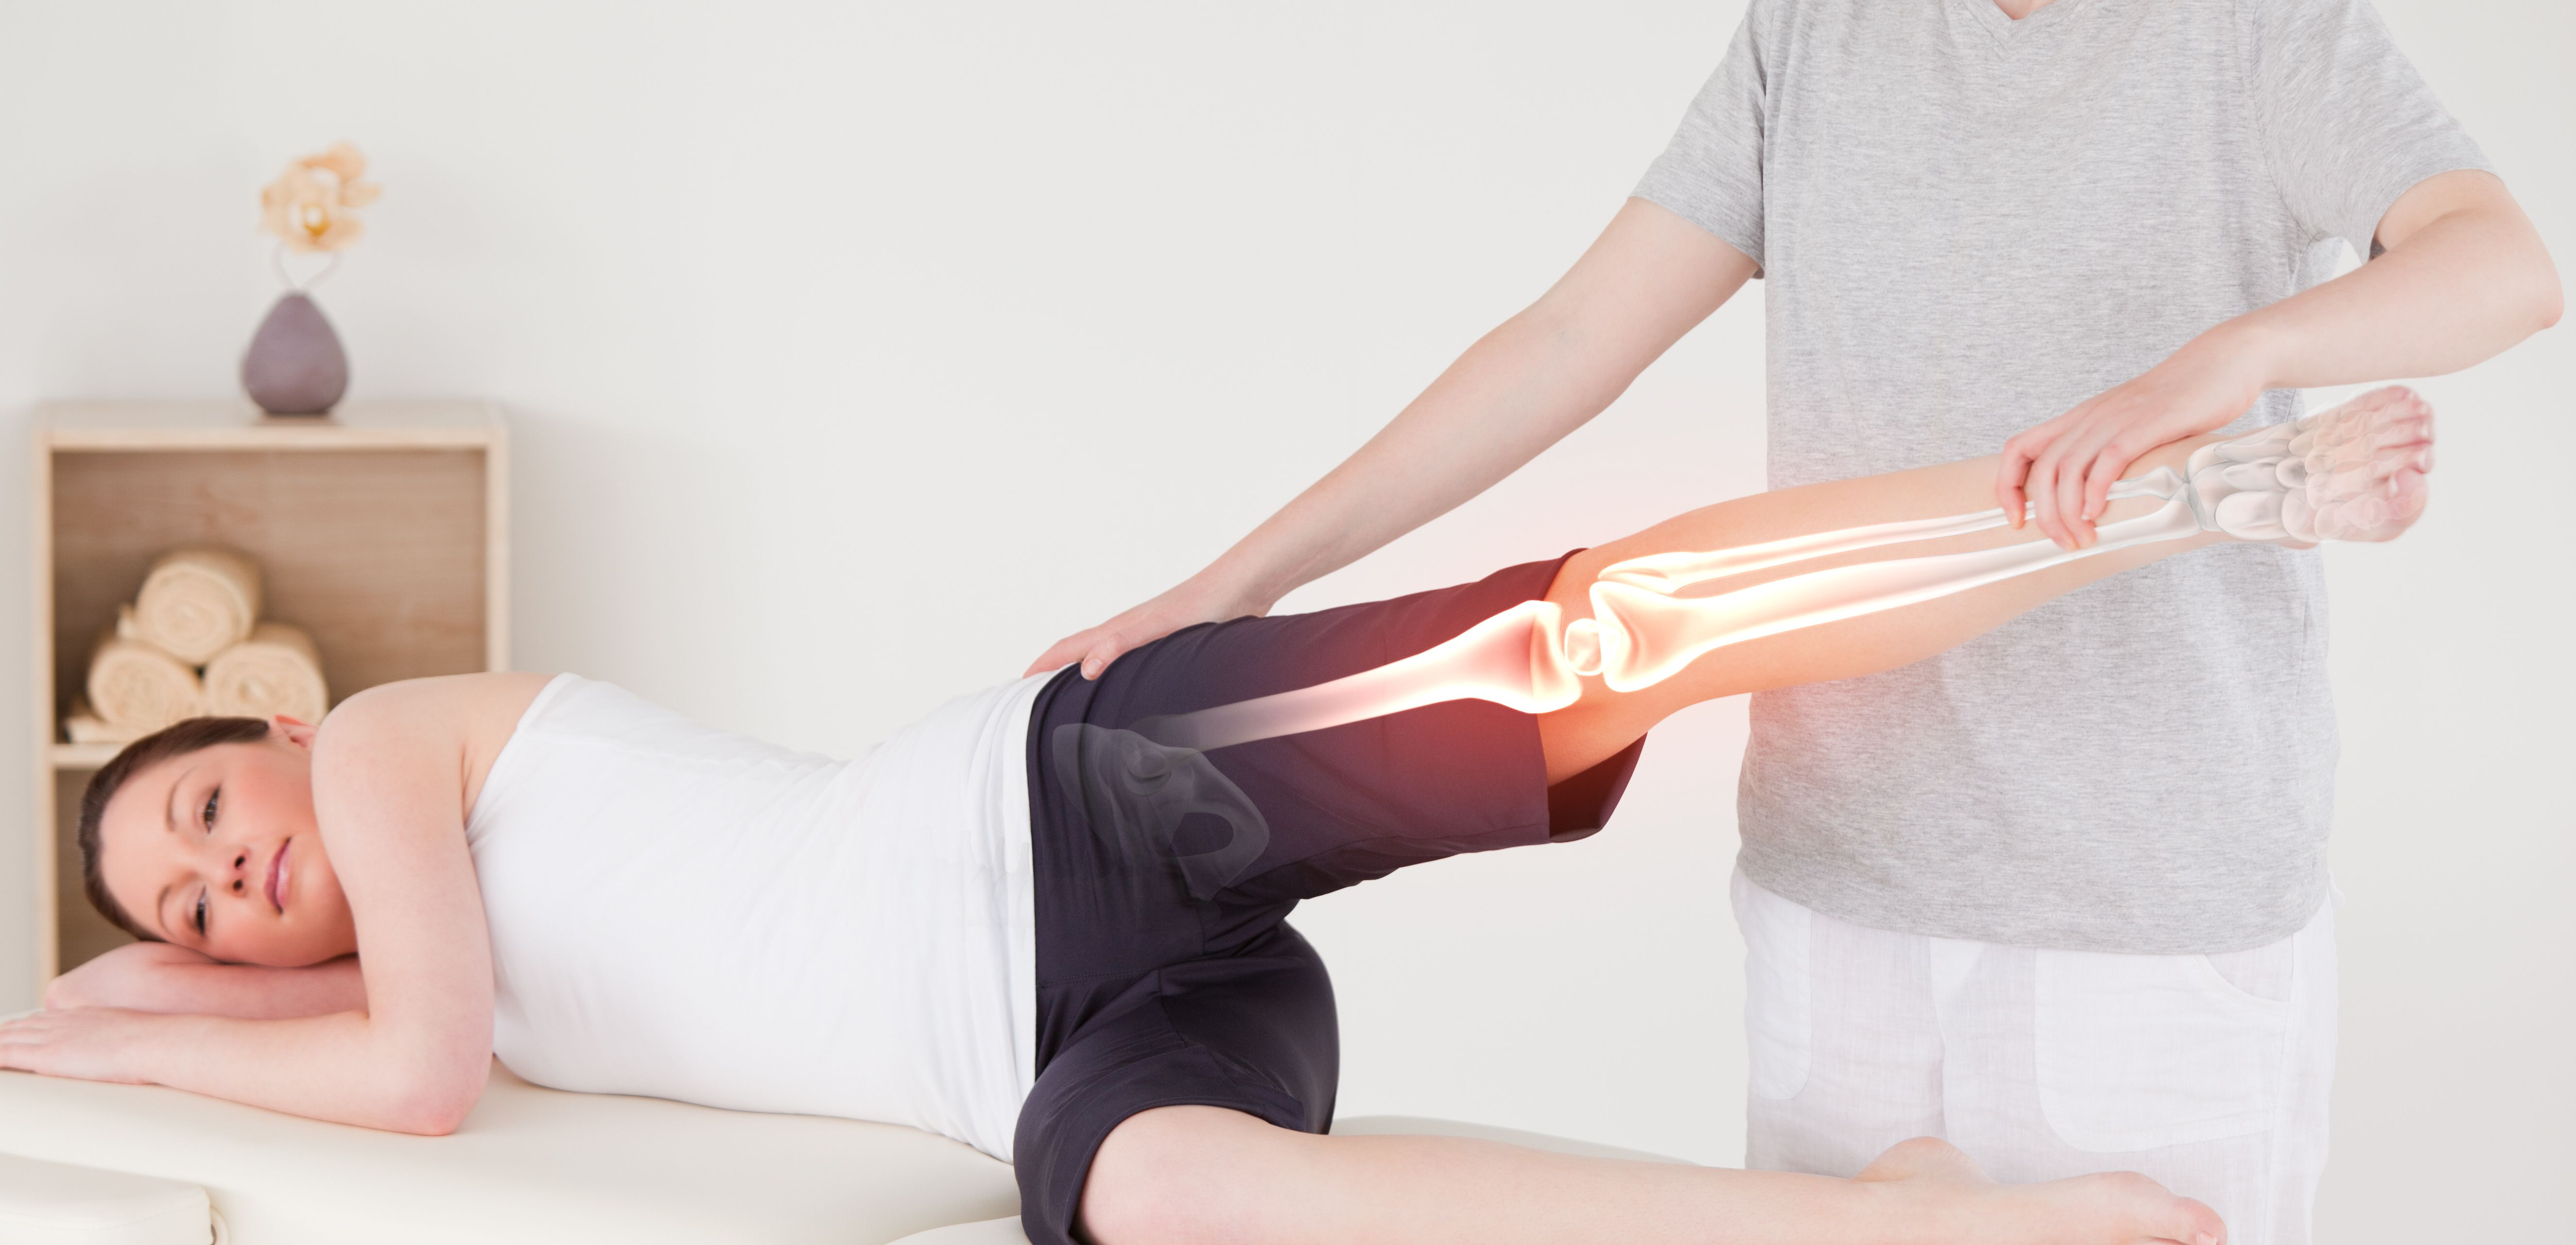 Osteopatía: Servicios de Fisio & Fisio